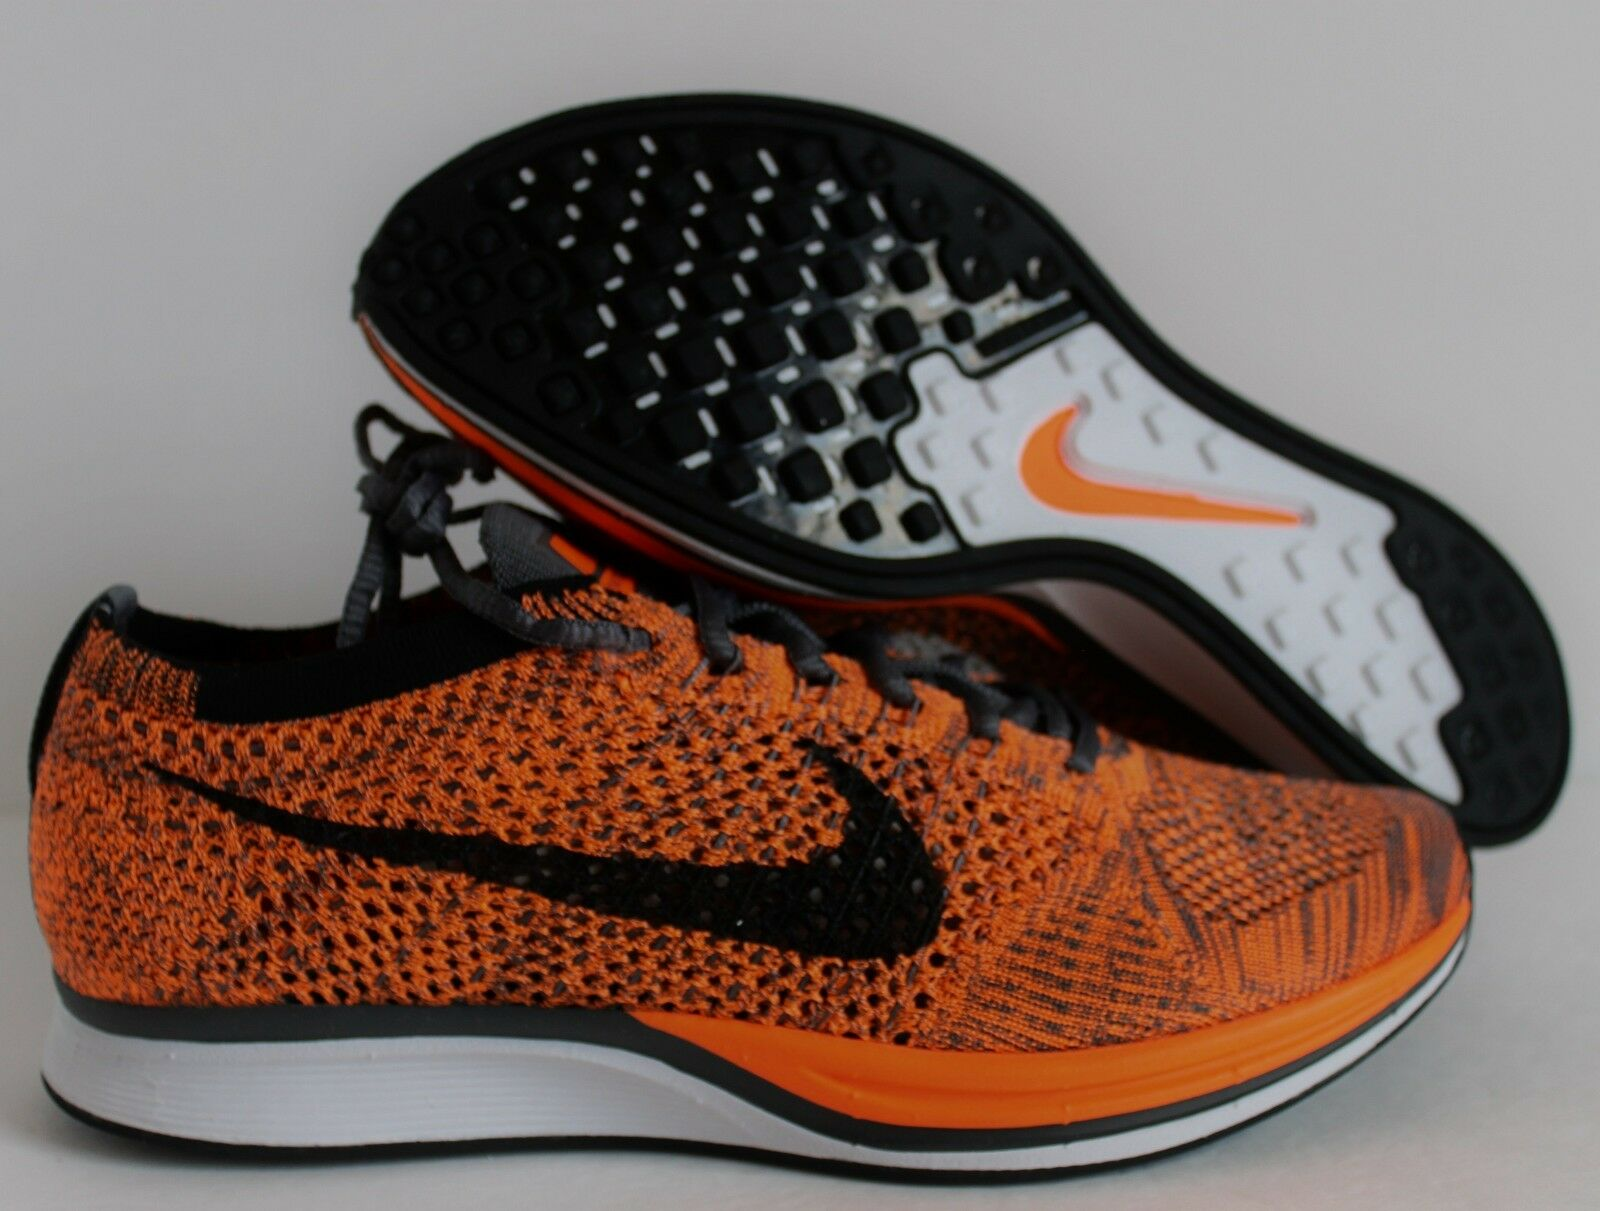 Nike  flyknit racer insgesamt orange-Weiß-Grau orange-Weiß-Grau insgesamt sz 7 / frauen / sz 8,5 bd3960